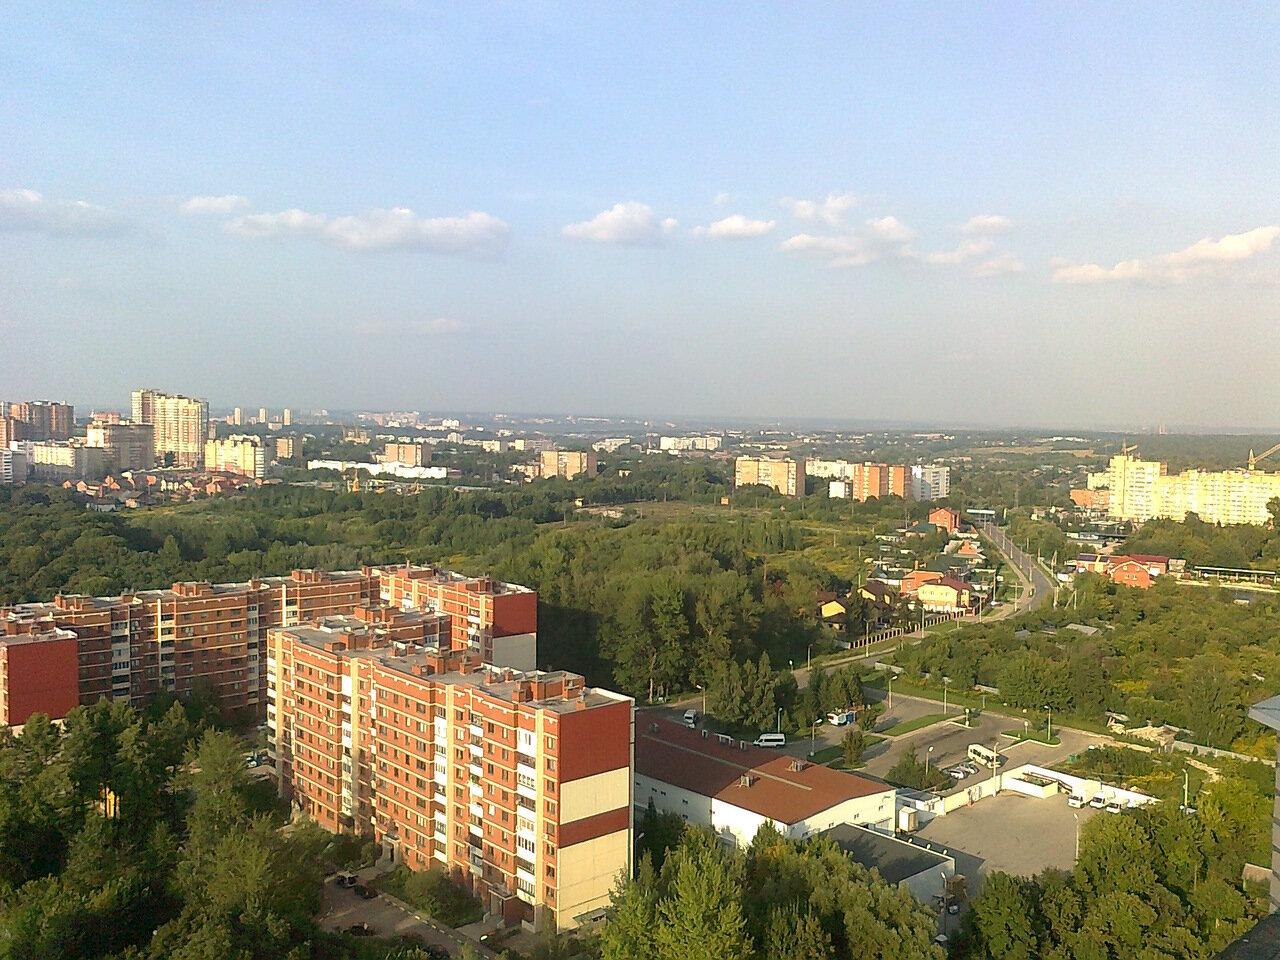 http://img-fotki.yandex.ru/get/9313/162482795.4/0_bc73a_12325bd4_XXXL.jpg